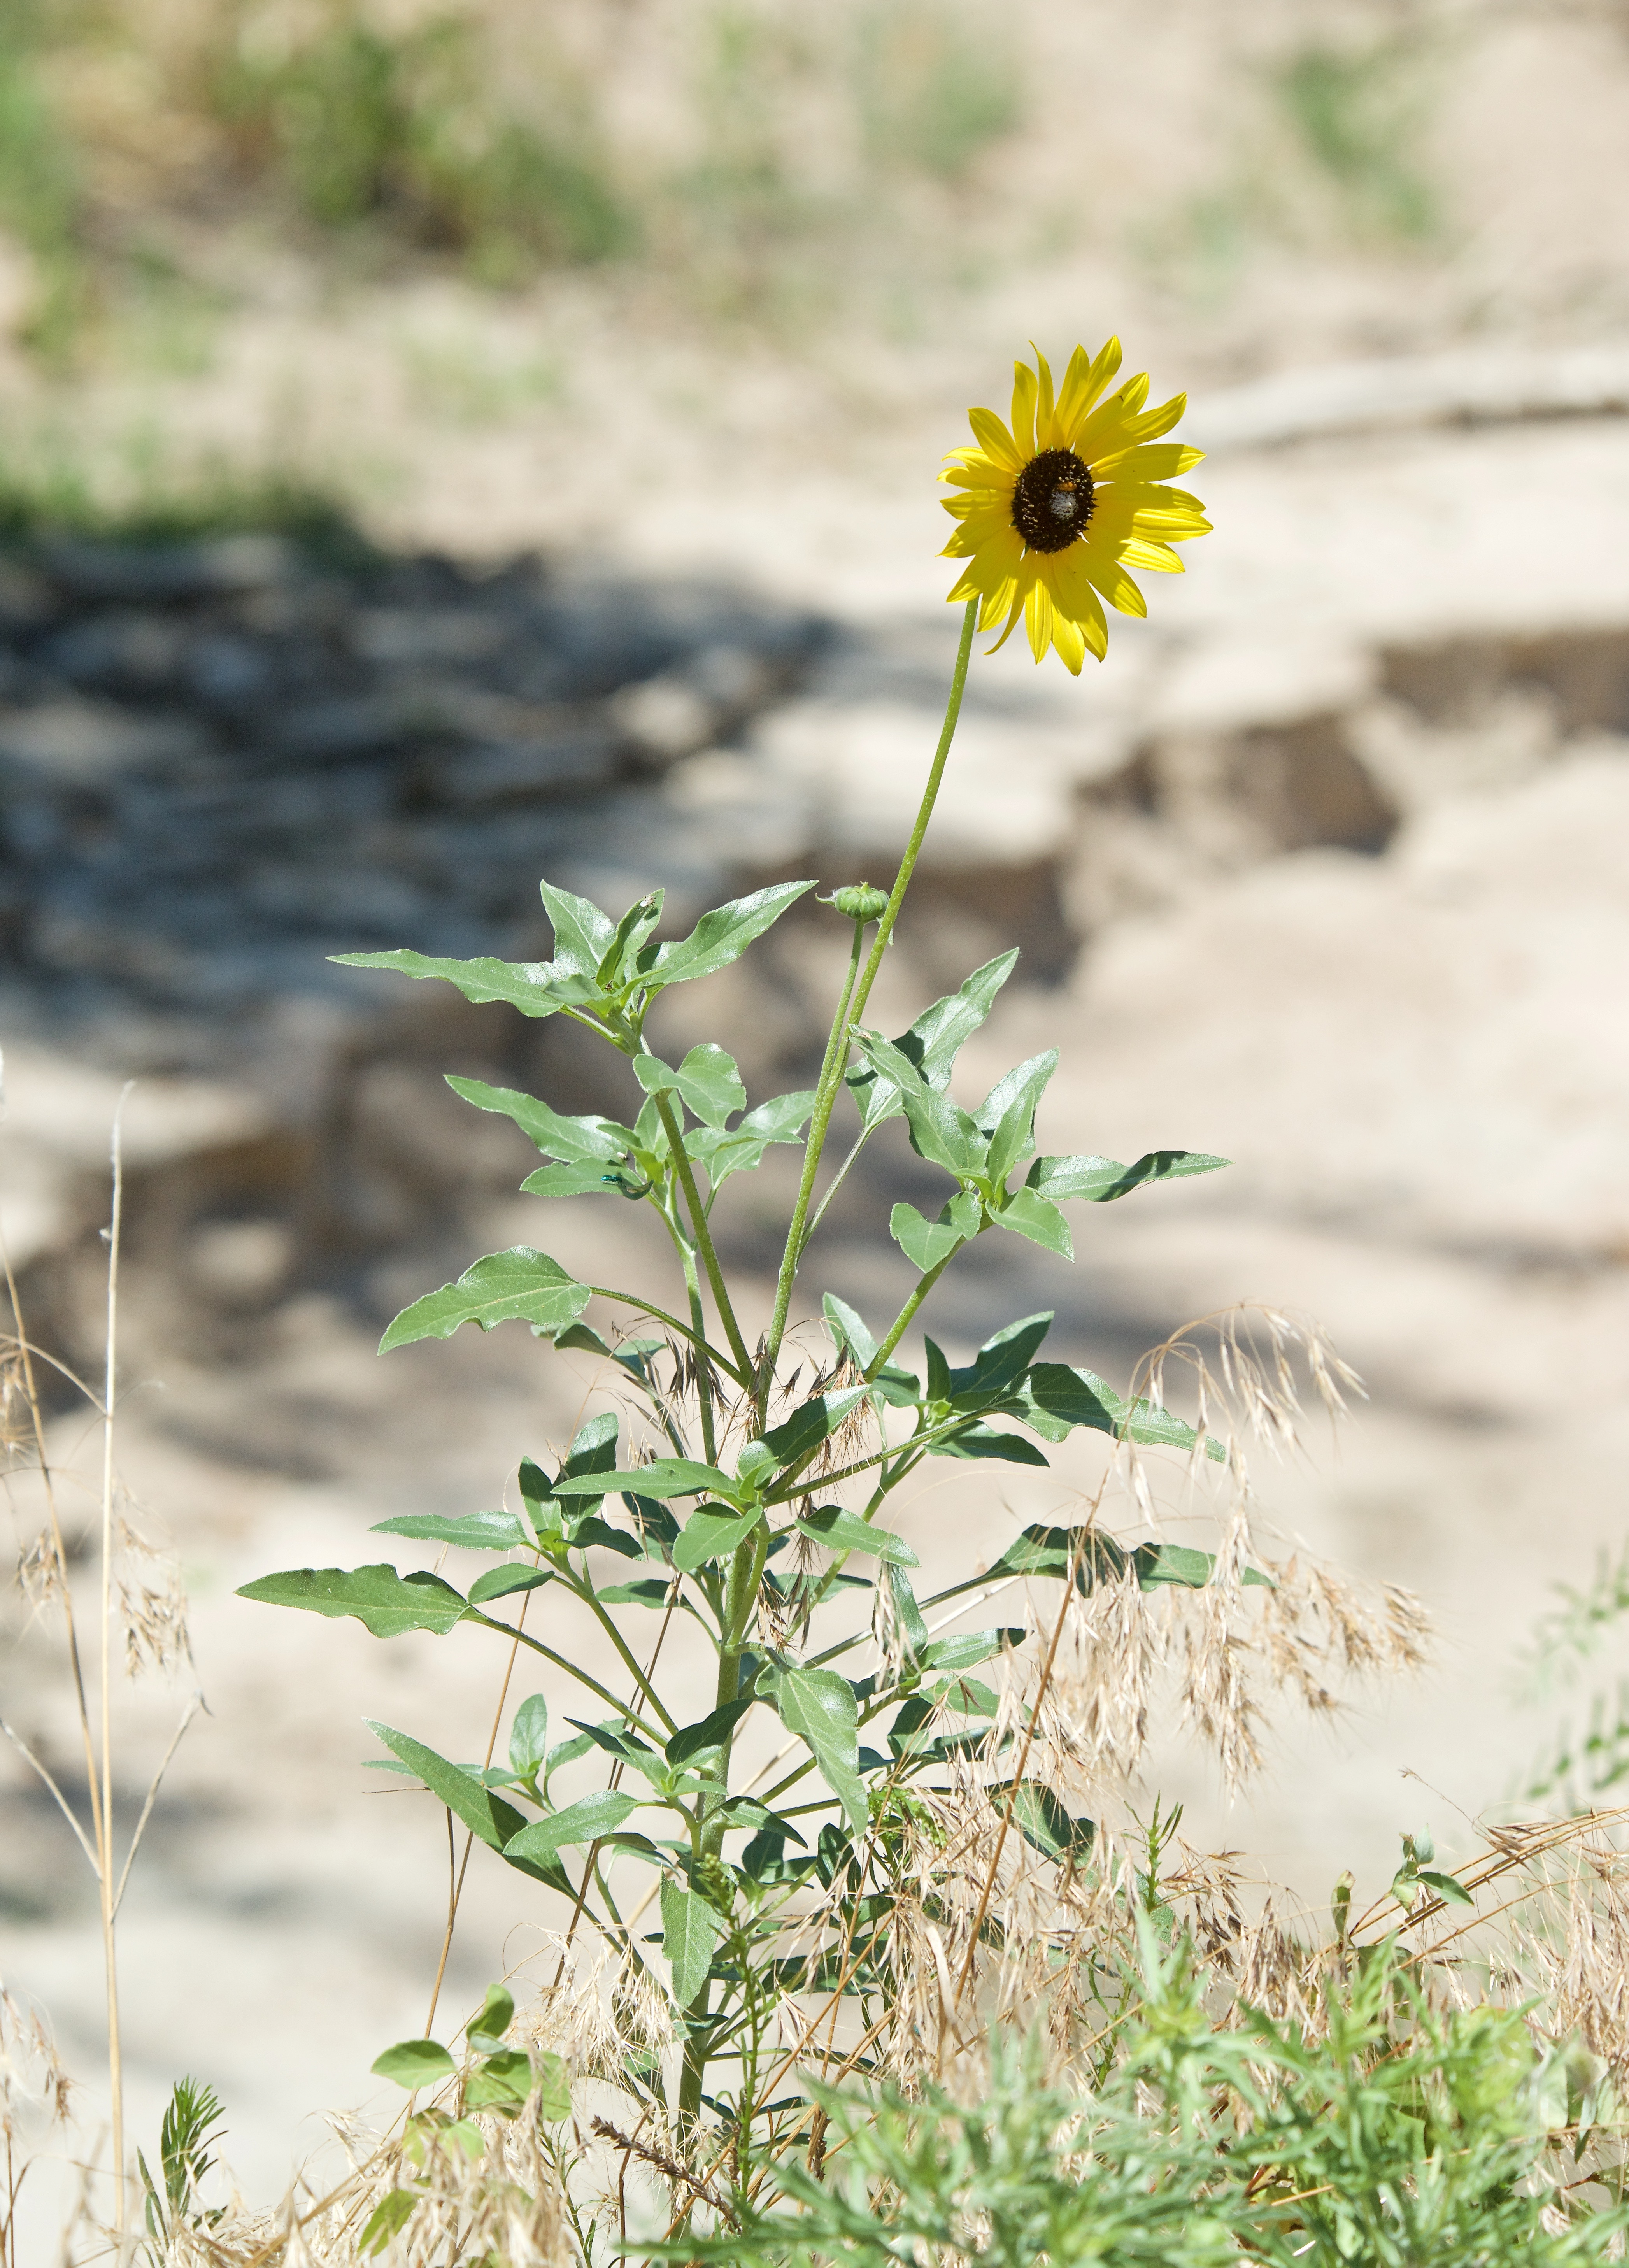 Prairie Sunflower (Helianthus petiolaris)